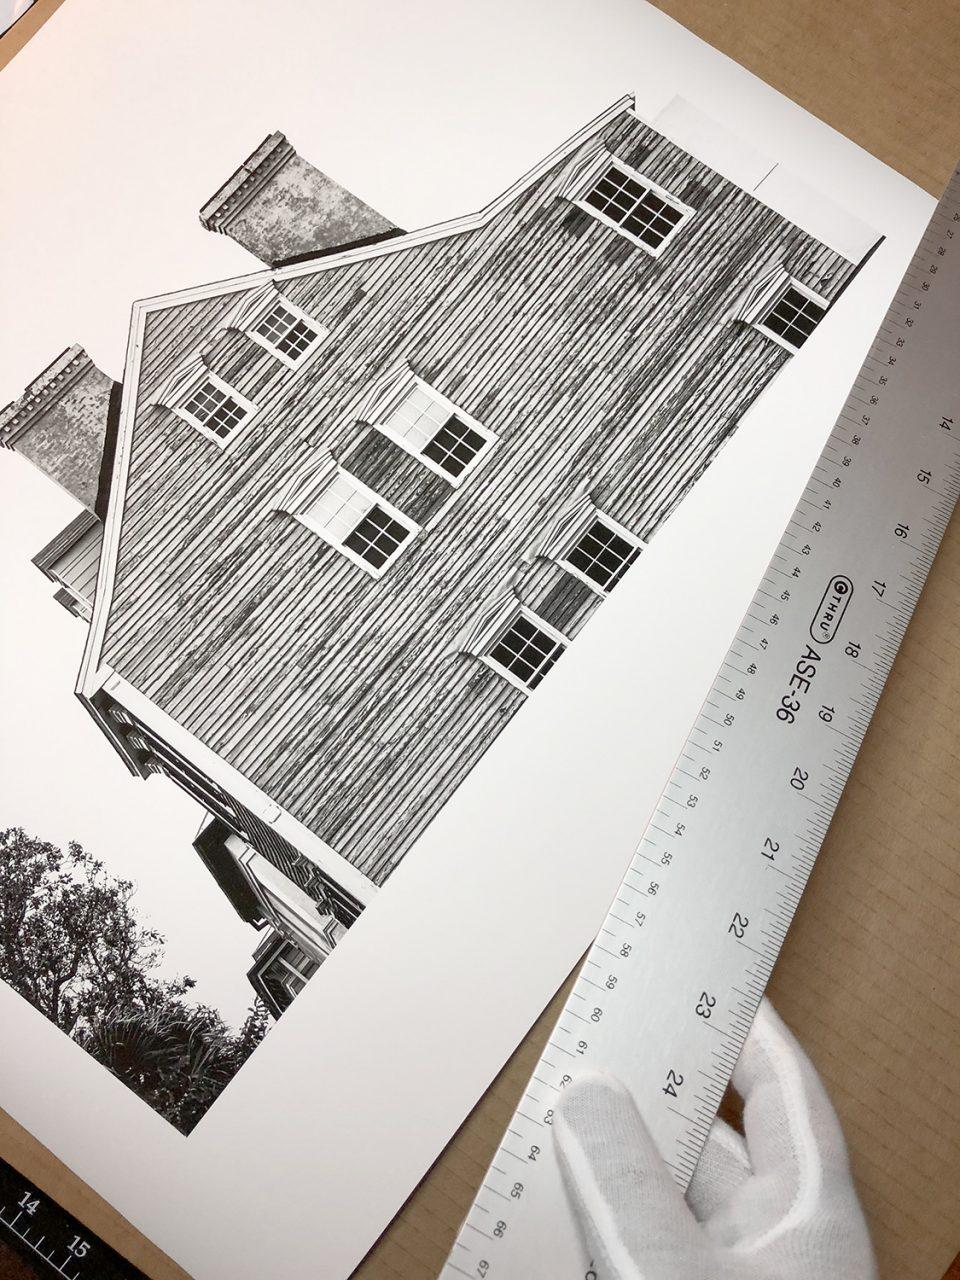 Historic Clapboard Houses in Savannah, Georgia. Buy a signed, fine art print here.